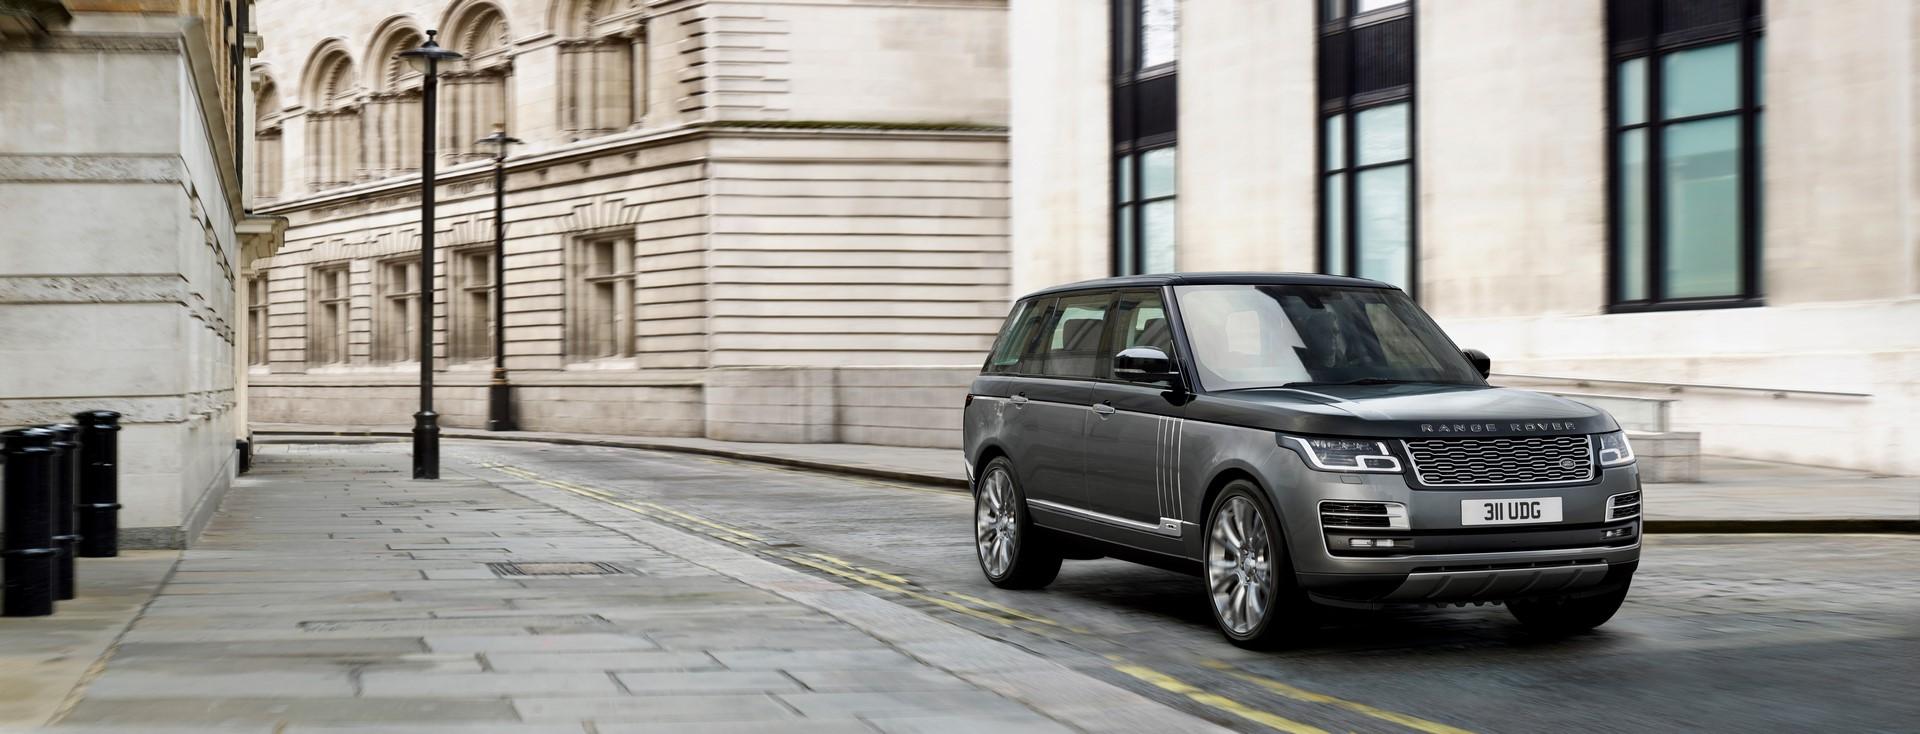 Range Rover SVAutobiography 2018 (20)